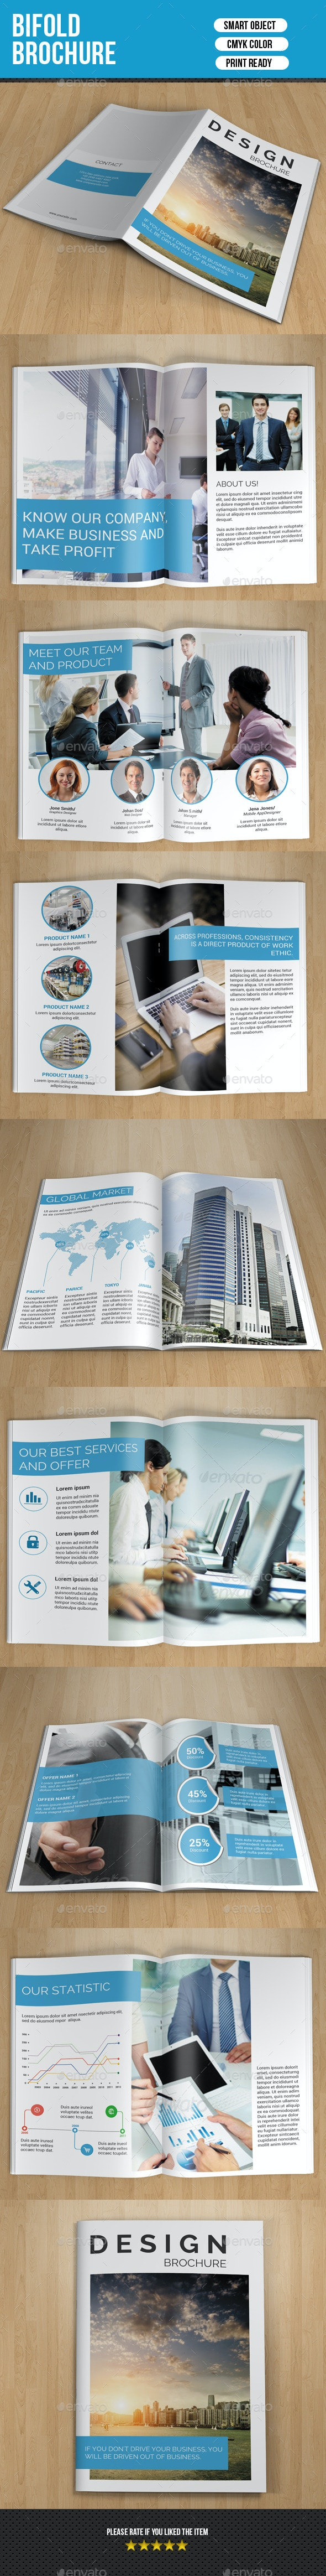 Bifold Business Brochure-V134 - Corporate Brochures